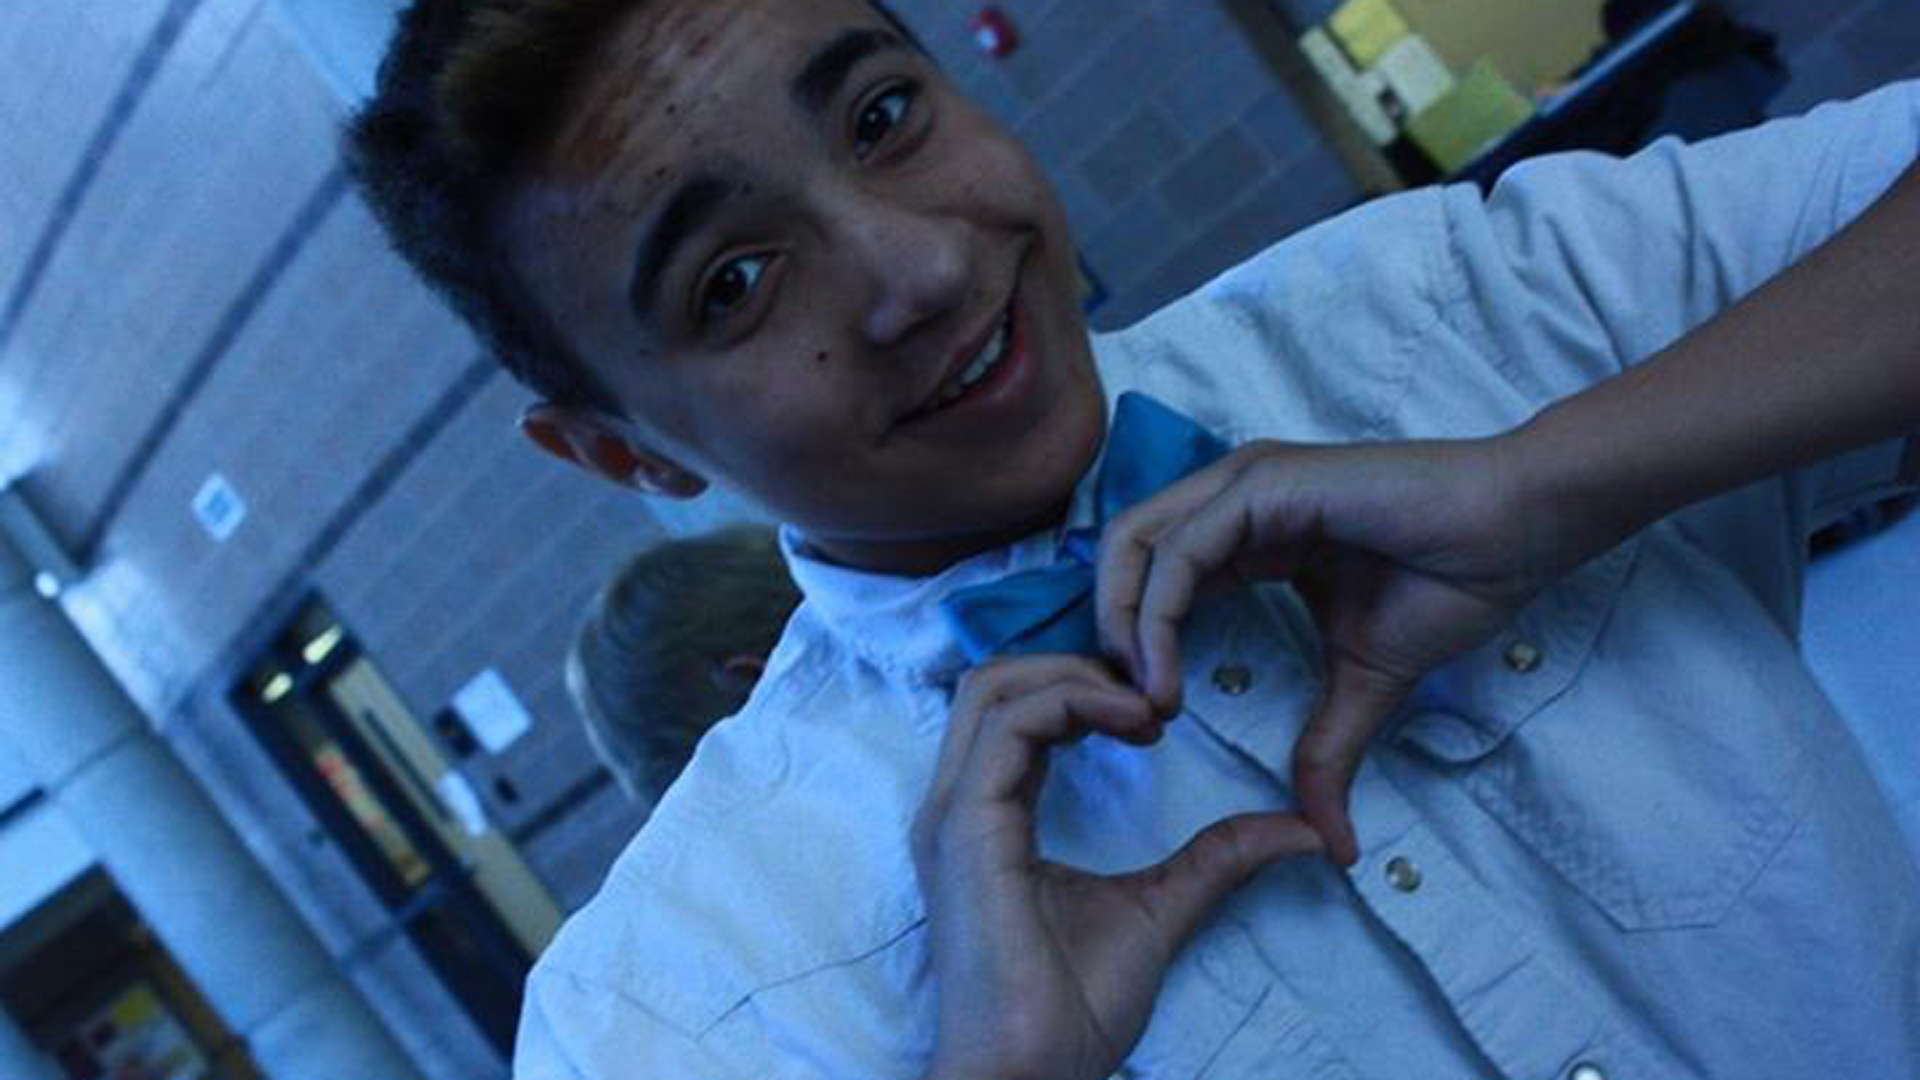 Bullied, gay teen's 'dying wish' denied...